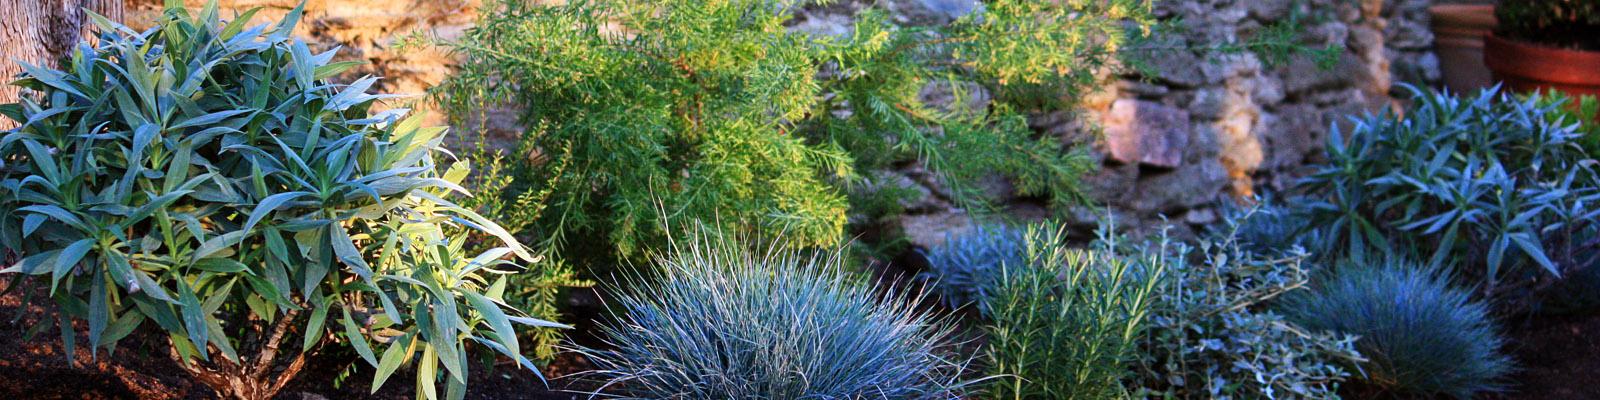 Green Parrot Gardens | Your Garden Style | Classic Mediterranean Garden